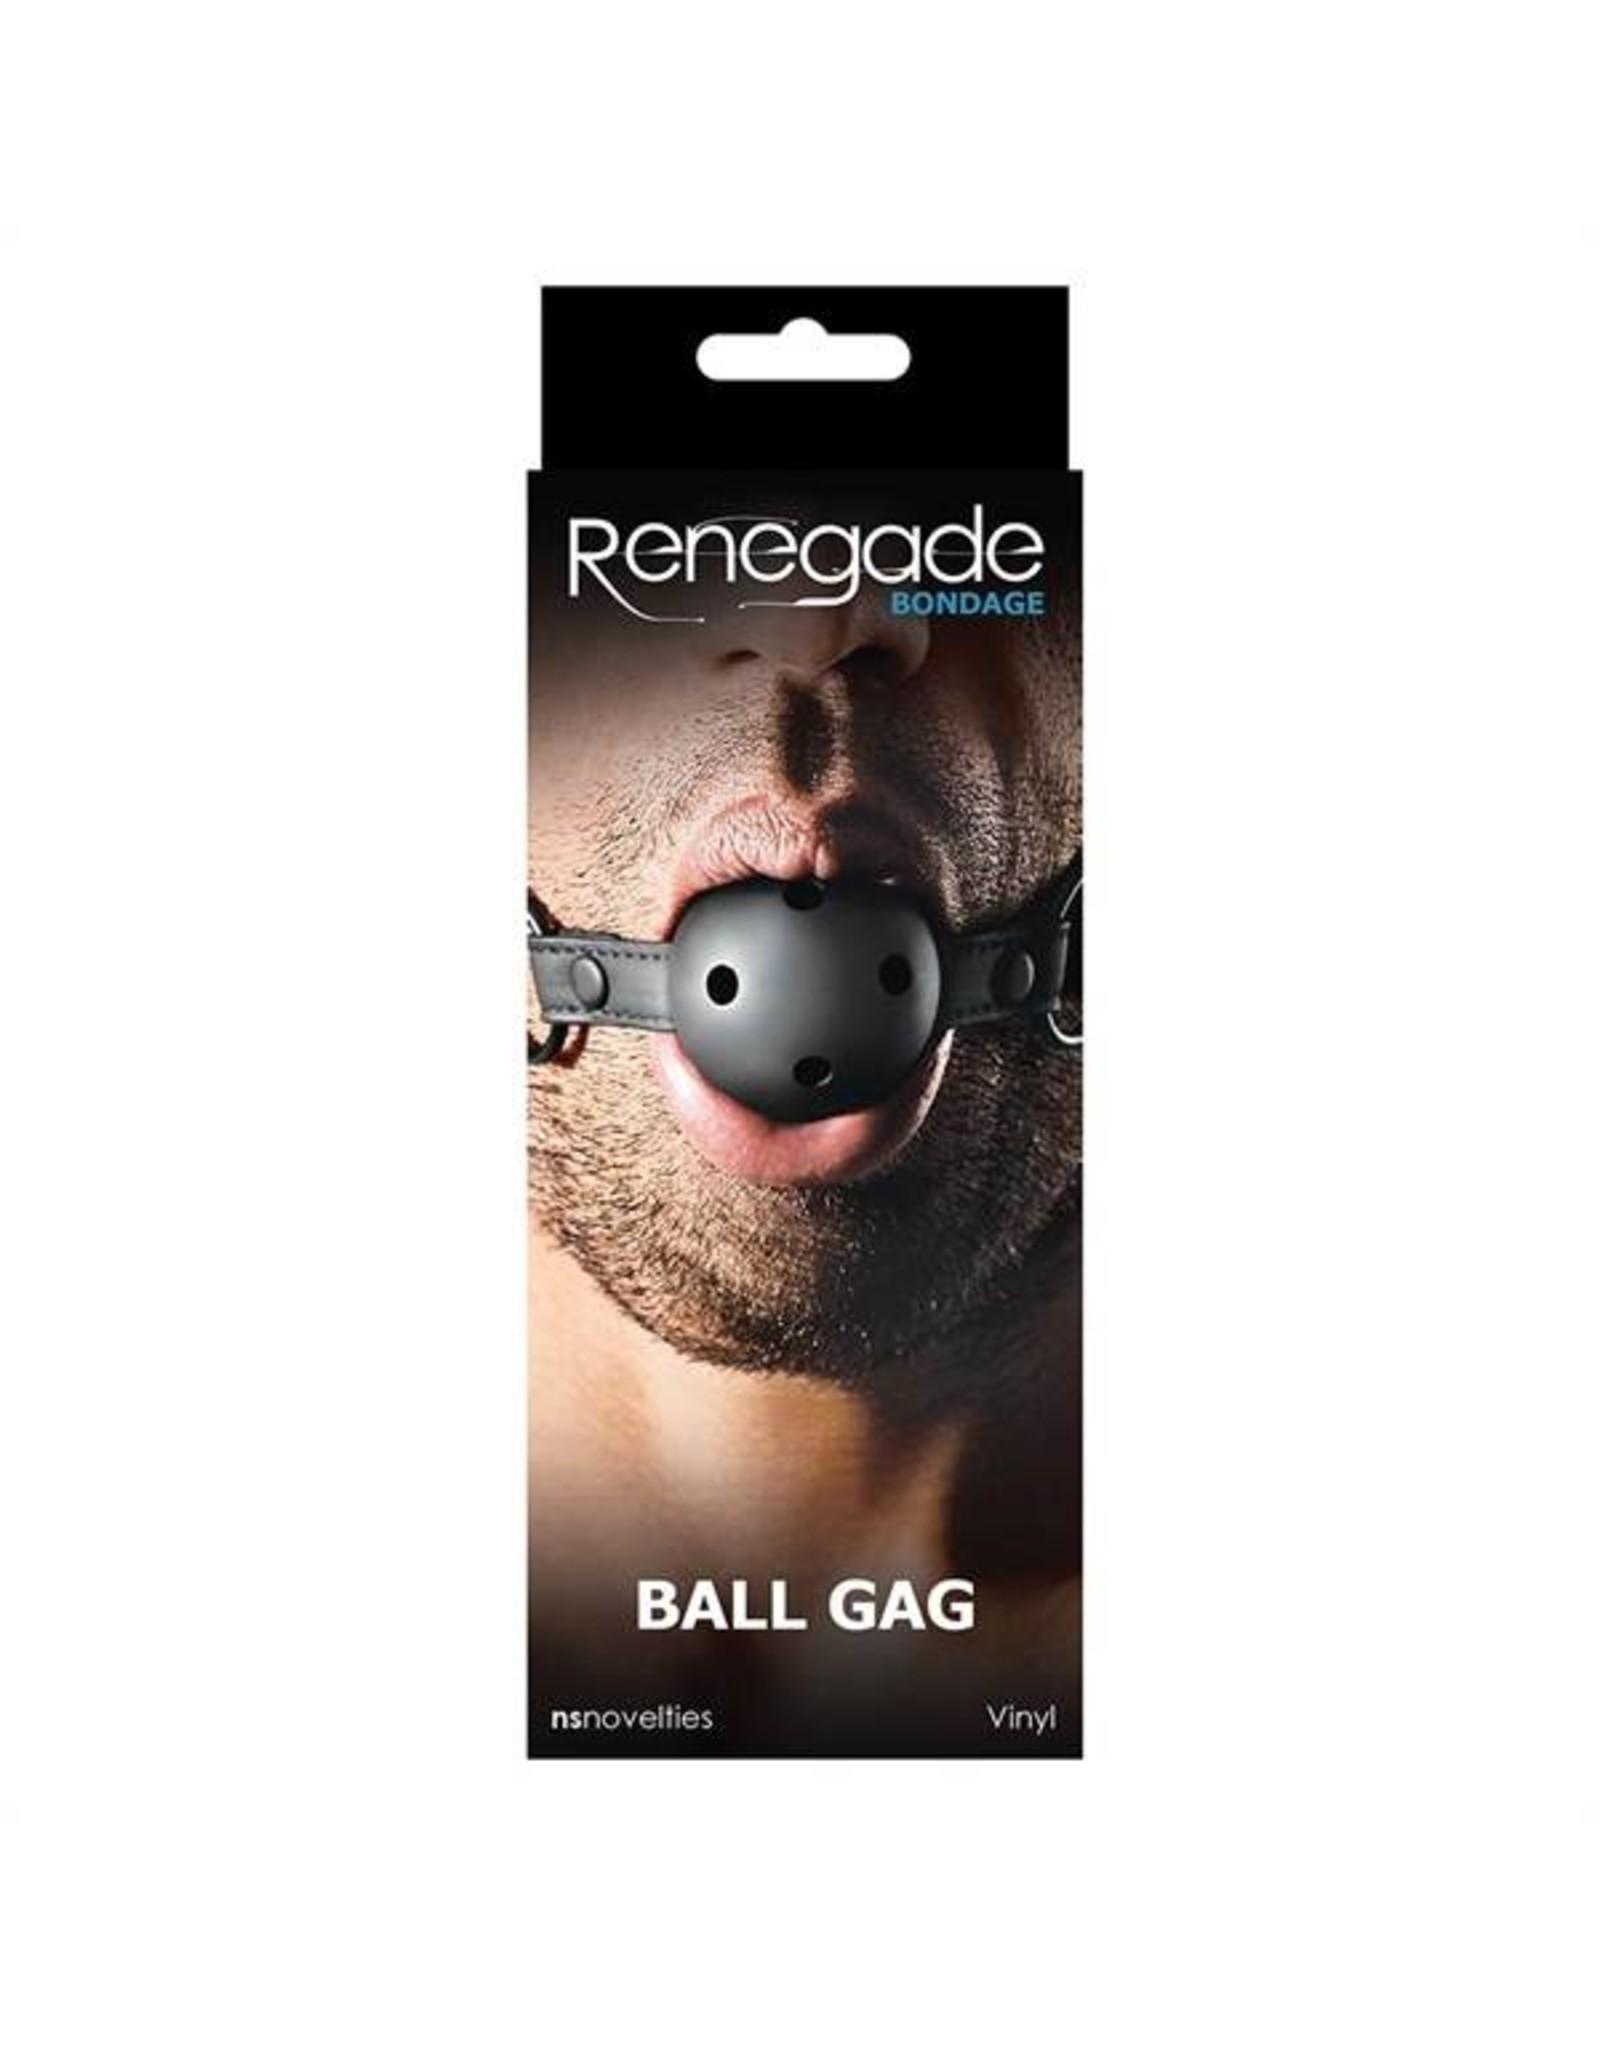 Renegade Bondage Ball Gag